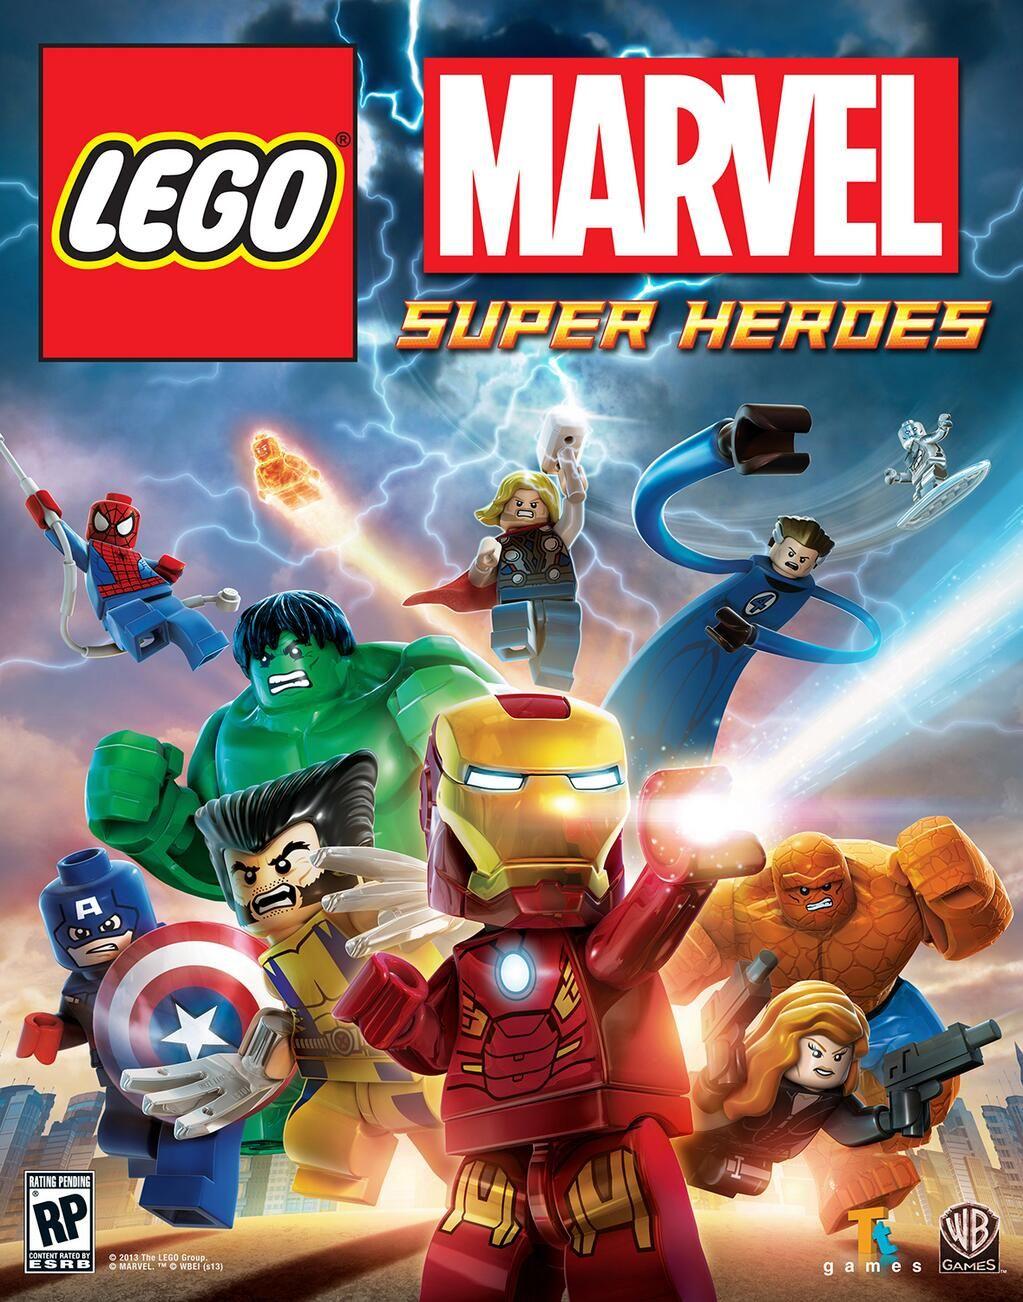 Custom Jigsaw Marvel Super heroes minifigures punisher on lego bricks